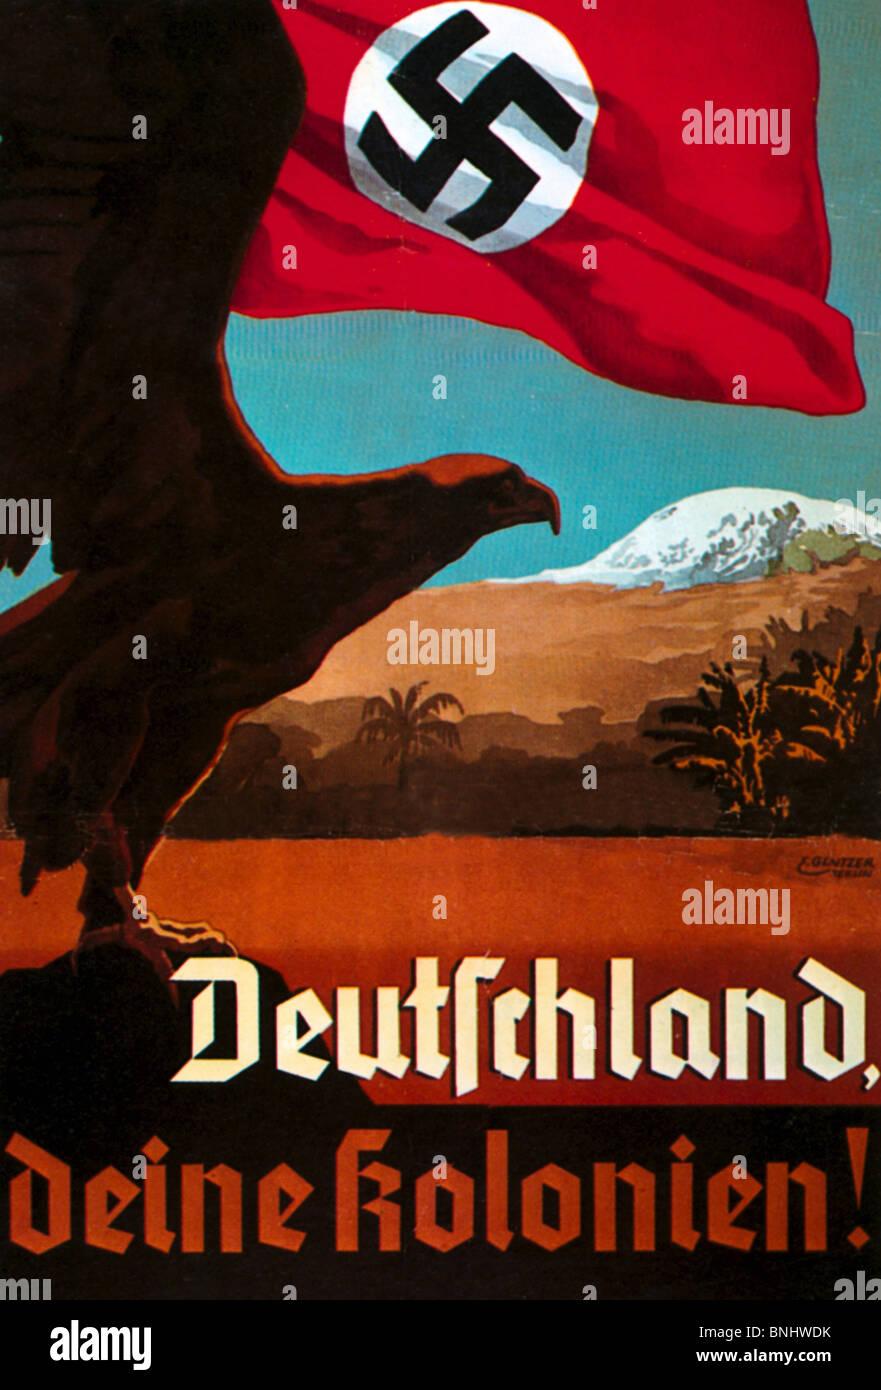 Germany 1935 colonialism Poster Propaganda Nazism Nazi Germany Germany history historic historical colonies colony Stock Photo